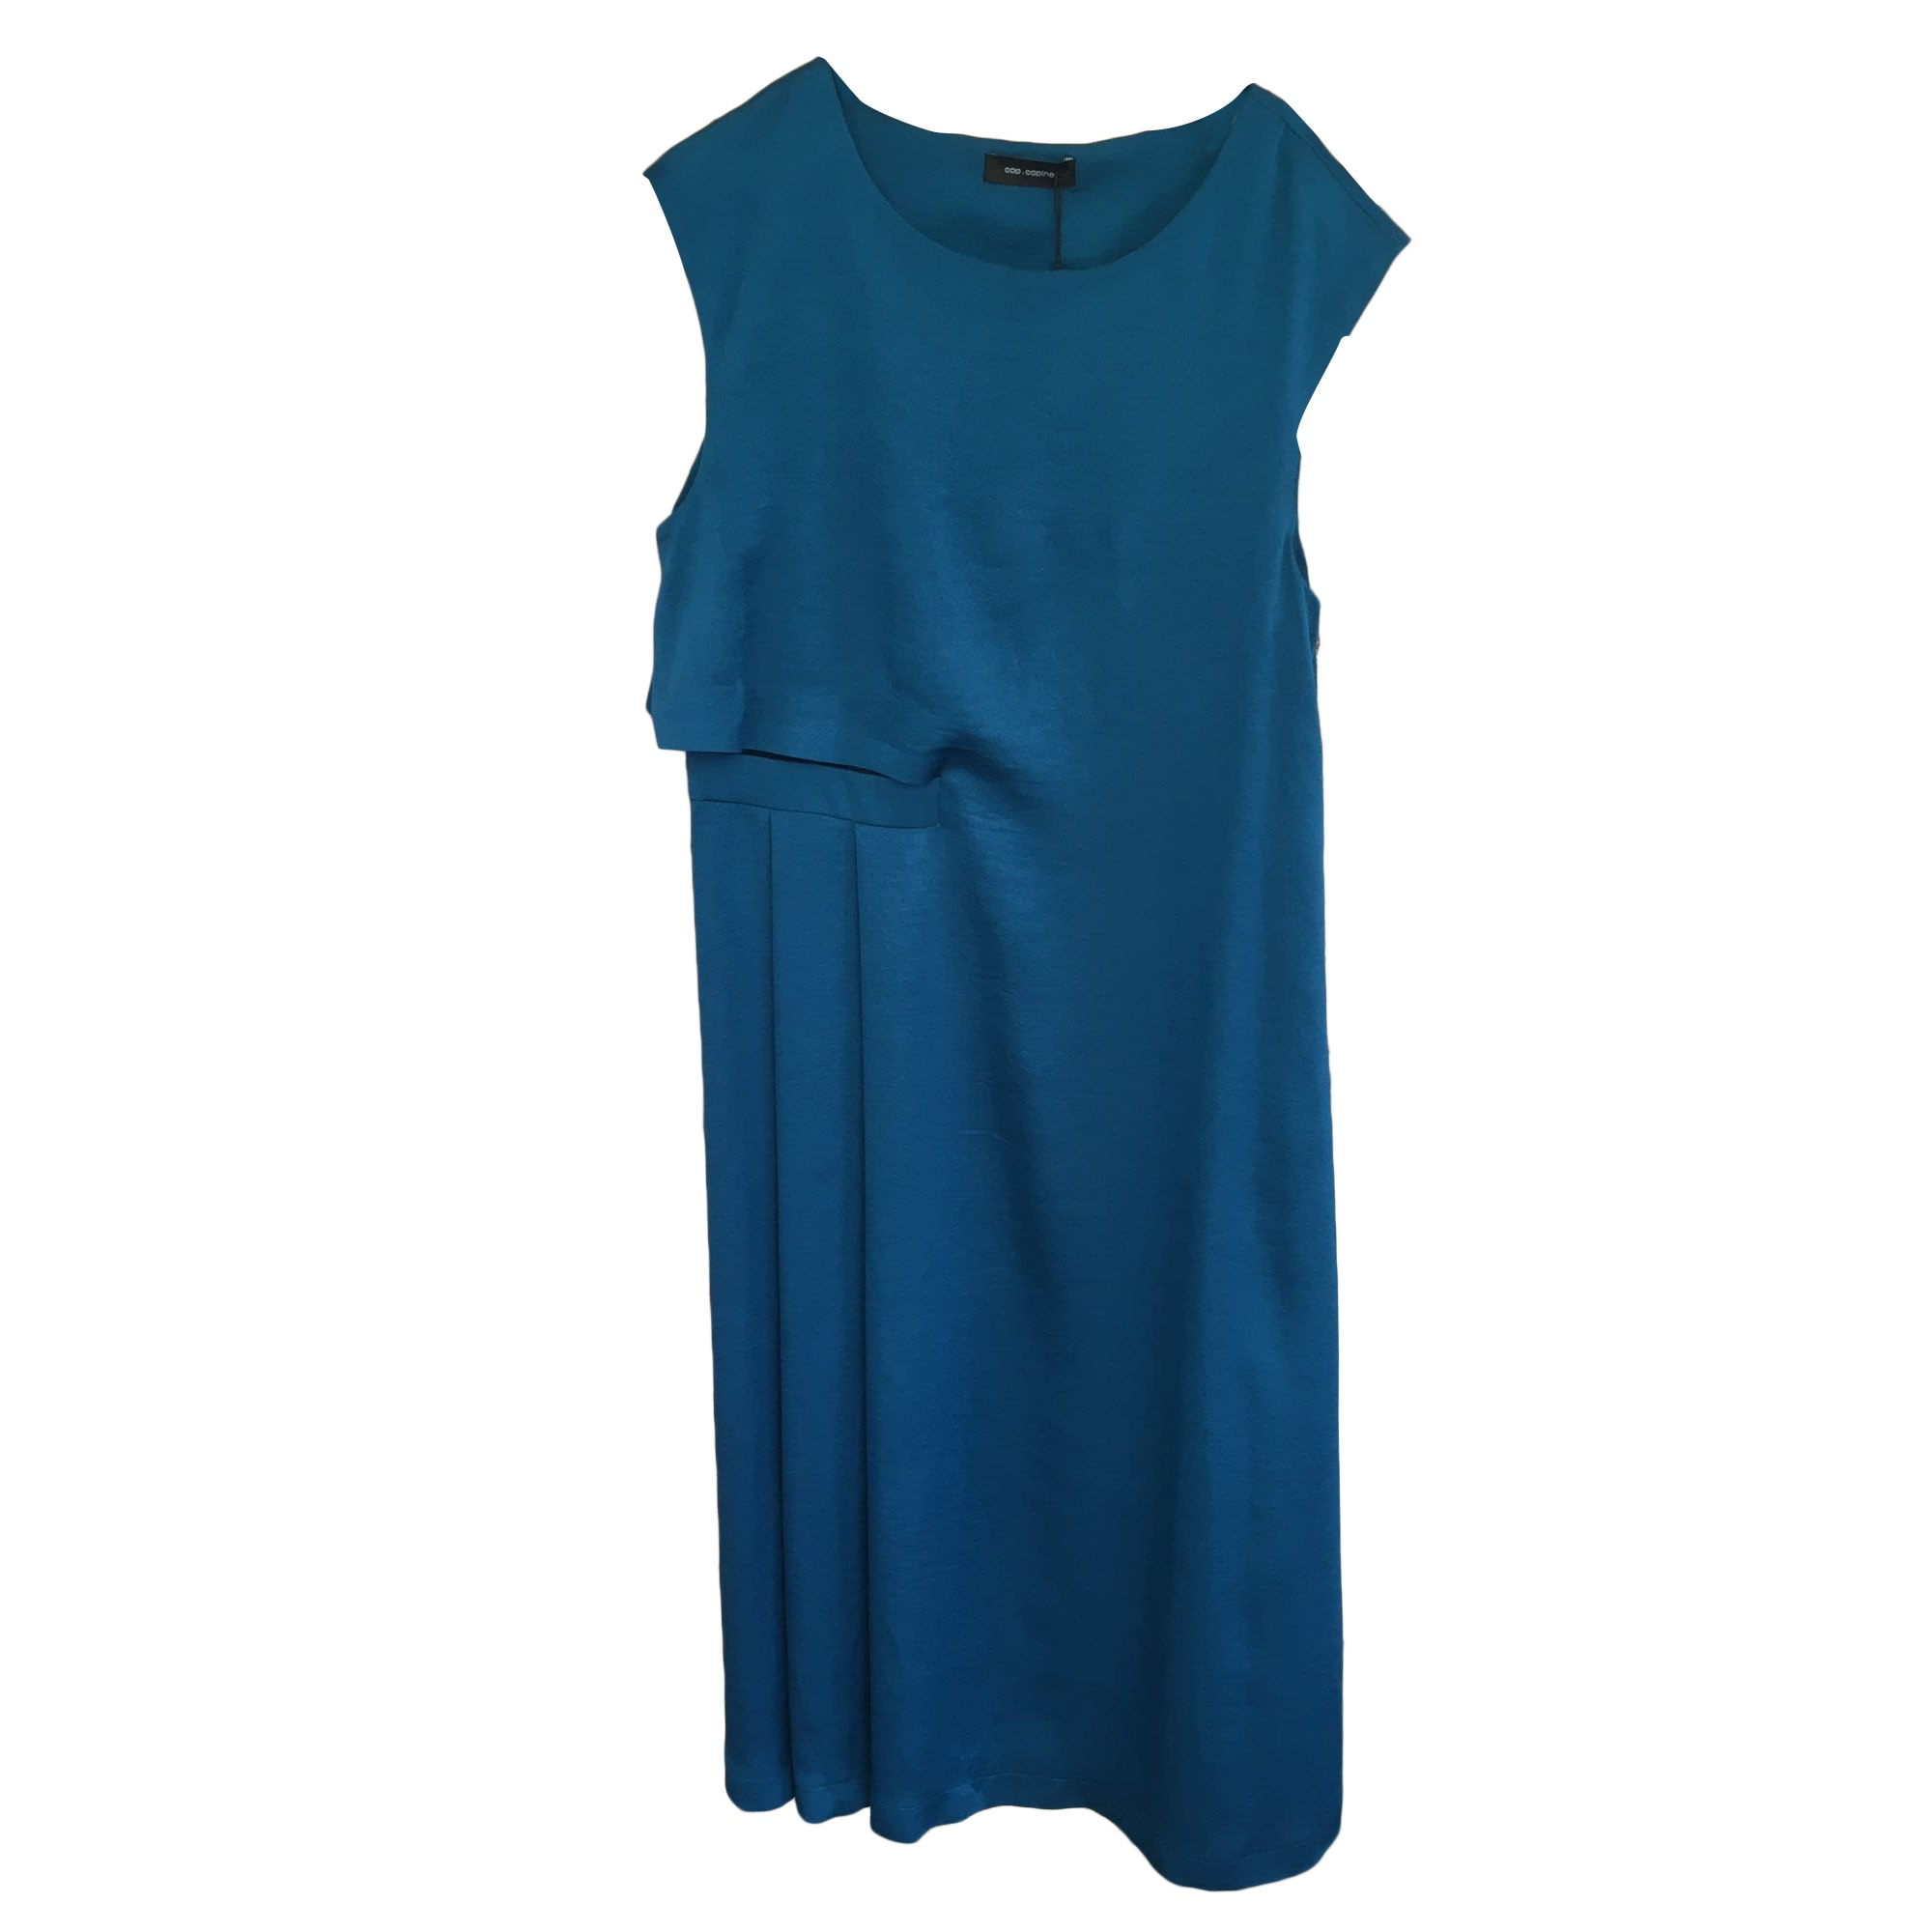 Robe longue COP-COPINE Bleu, bleu marine, bleu turquoise